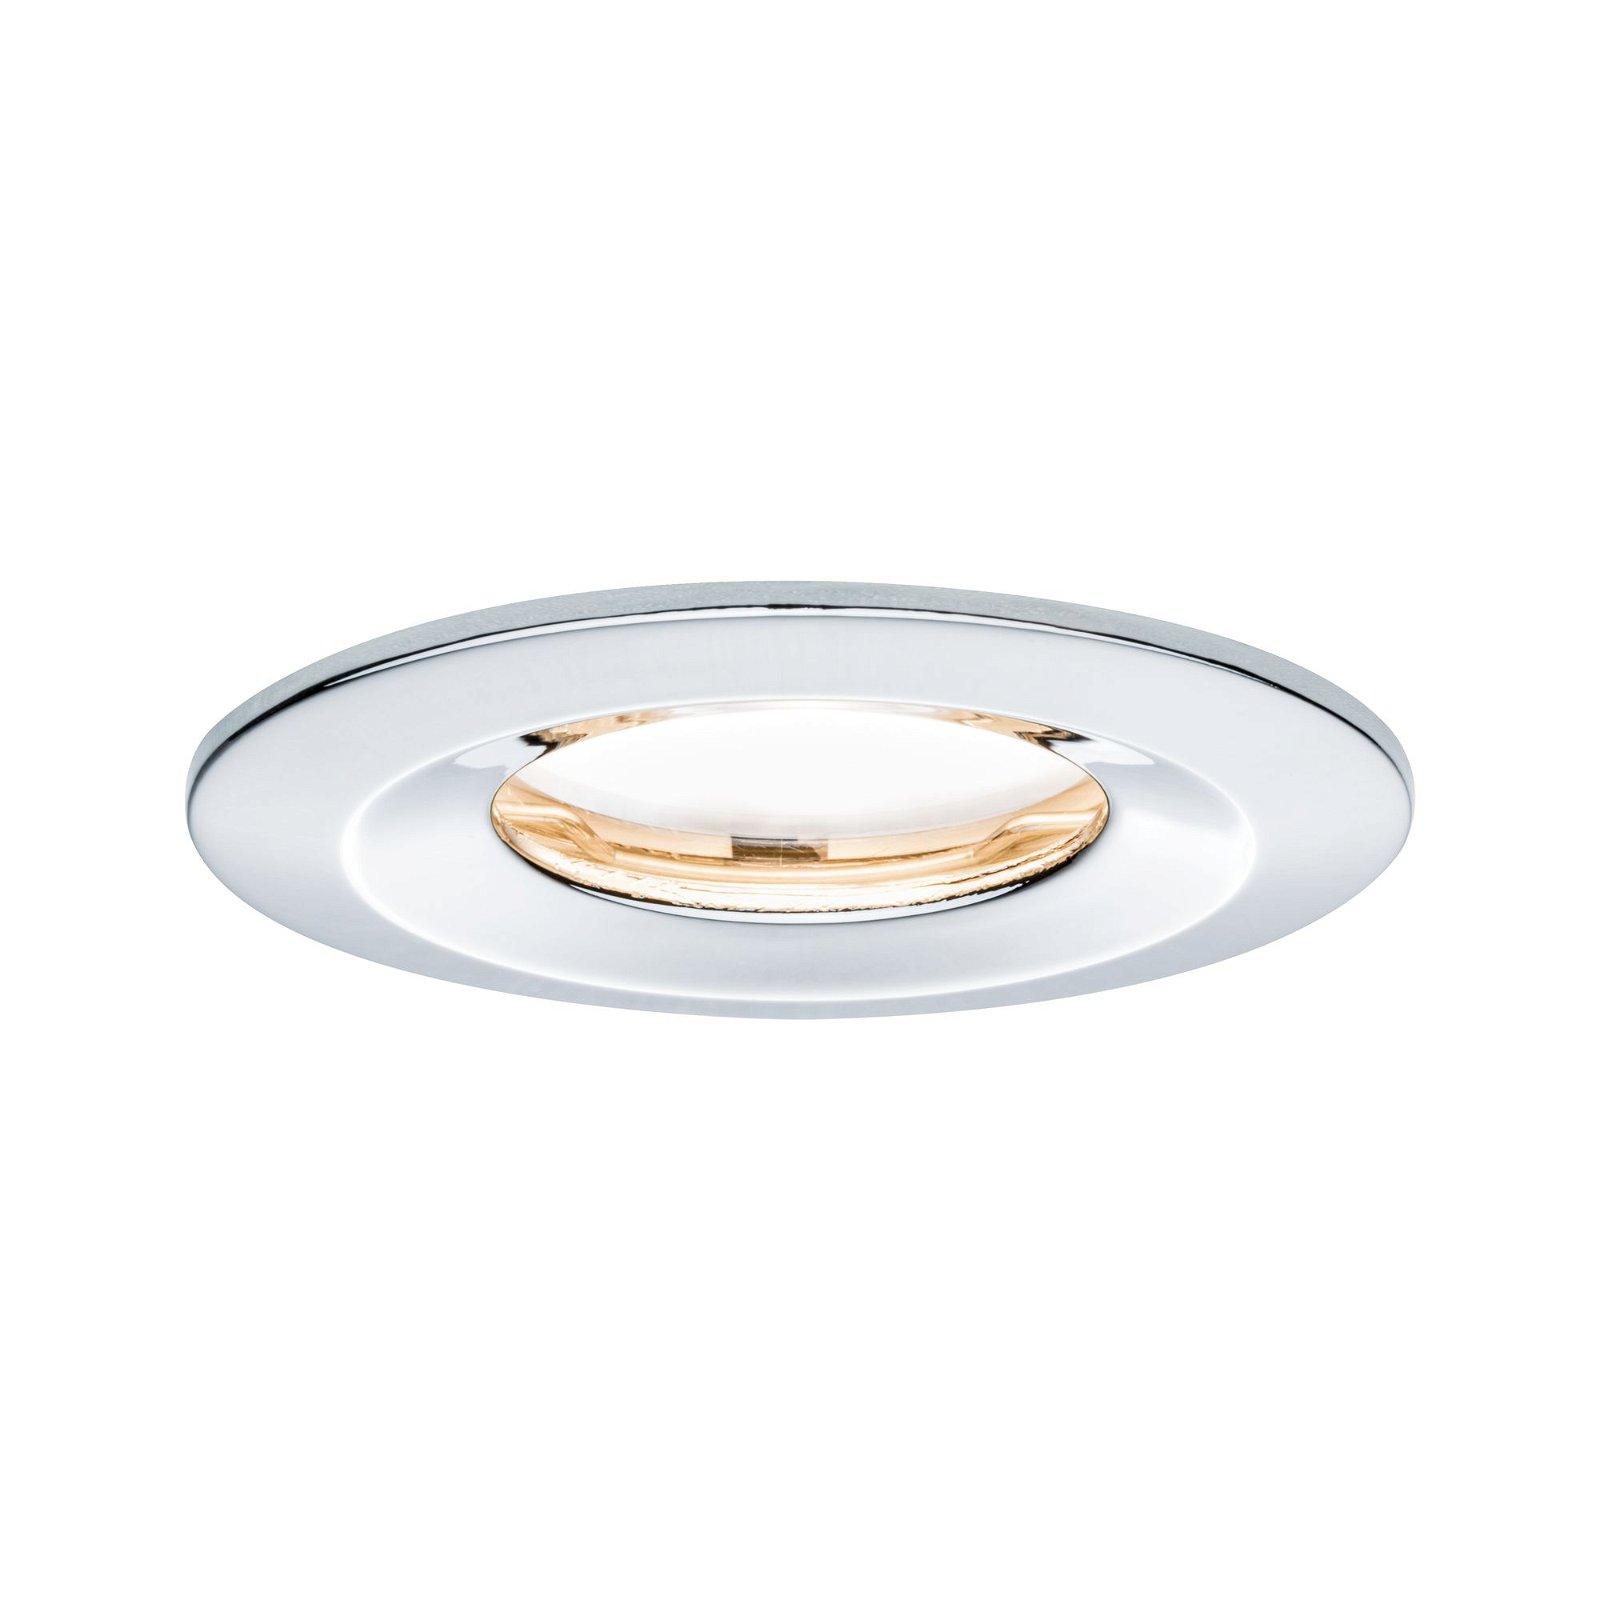 Spot encastré LED Nova Plus fixe IP65 rond 78mm Coin 6,8W 425lm 230V 2700K Chrome